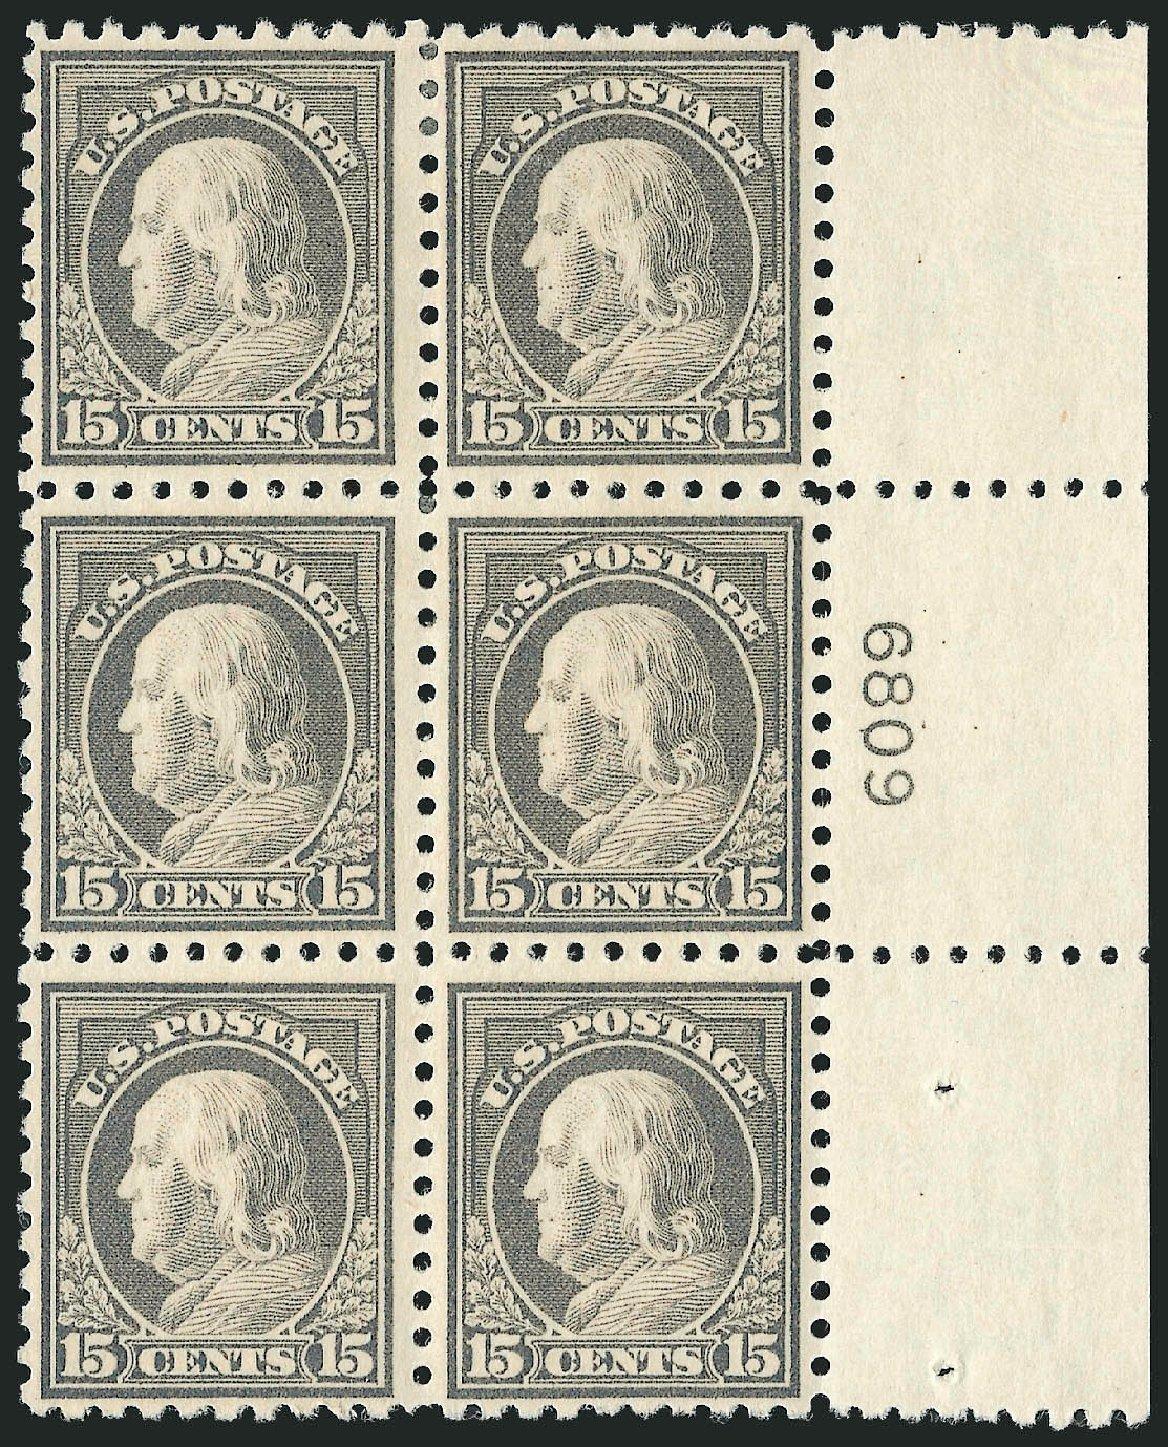 US Stamps Prices Scott Catalogue 437: 1914 15c Franklin Perf 10. Robert Siegel Auction Galleries, Jul 2014, Sale 1077, Lot 270